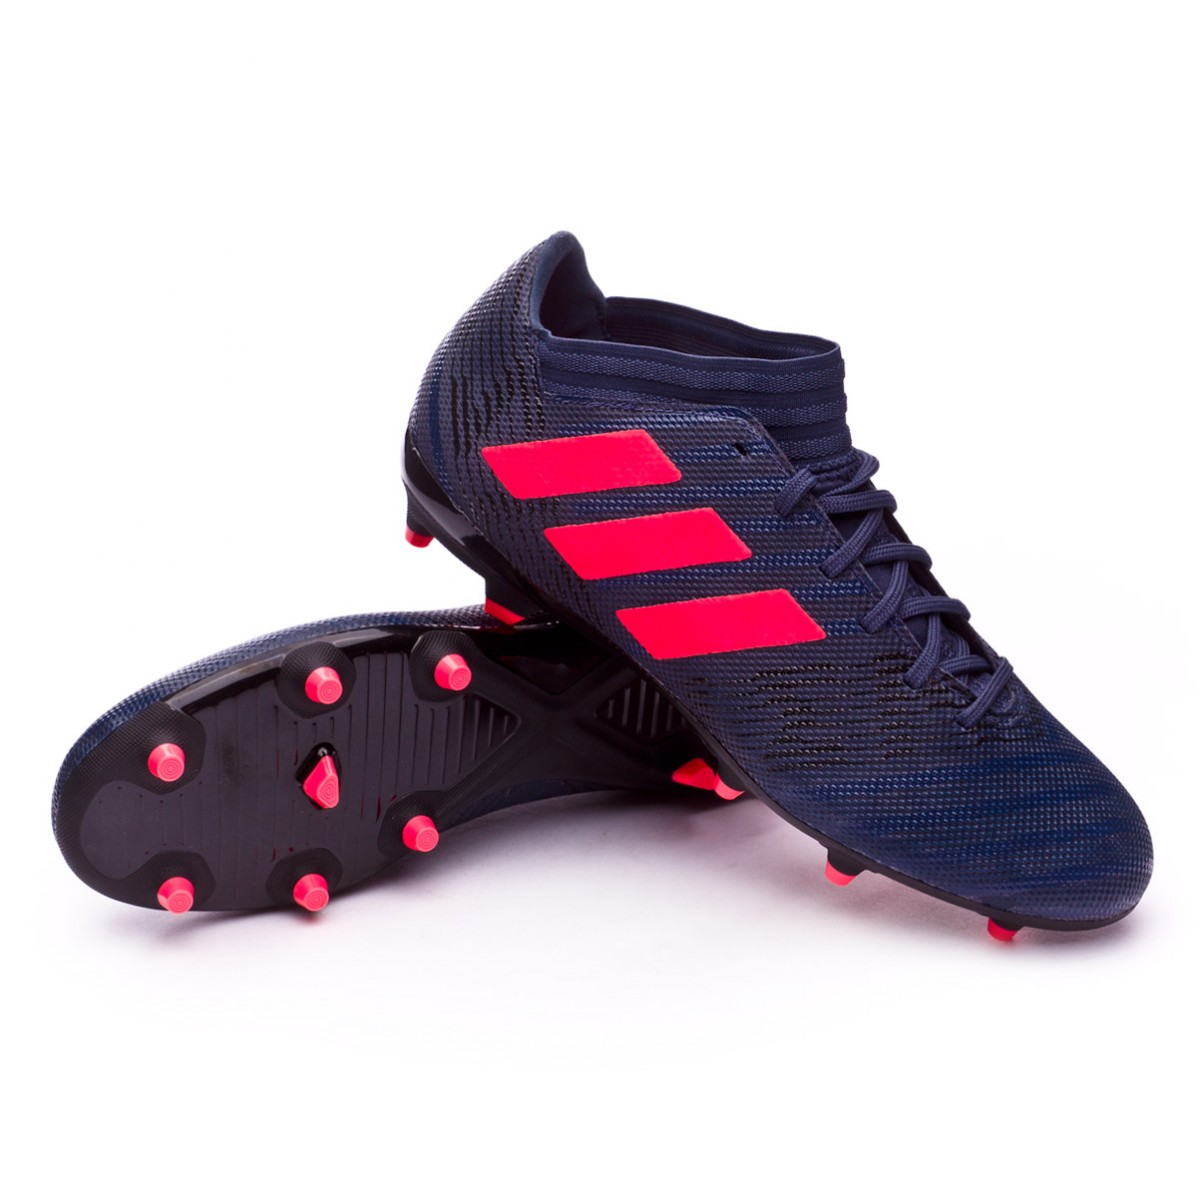 premium selection 09436 4b0bc Zapatos de fútbol adidas Nemeziz 17.3 FG Mujer Trace blue-Red zest-Core  black - Soloporteros es ahora Fútbol Emotion